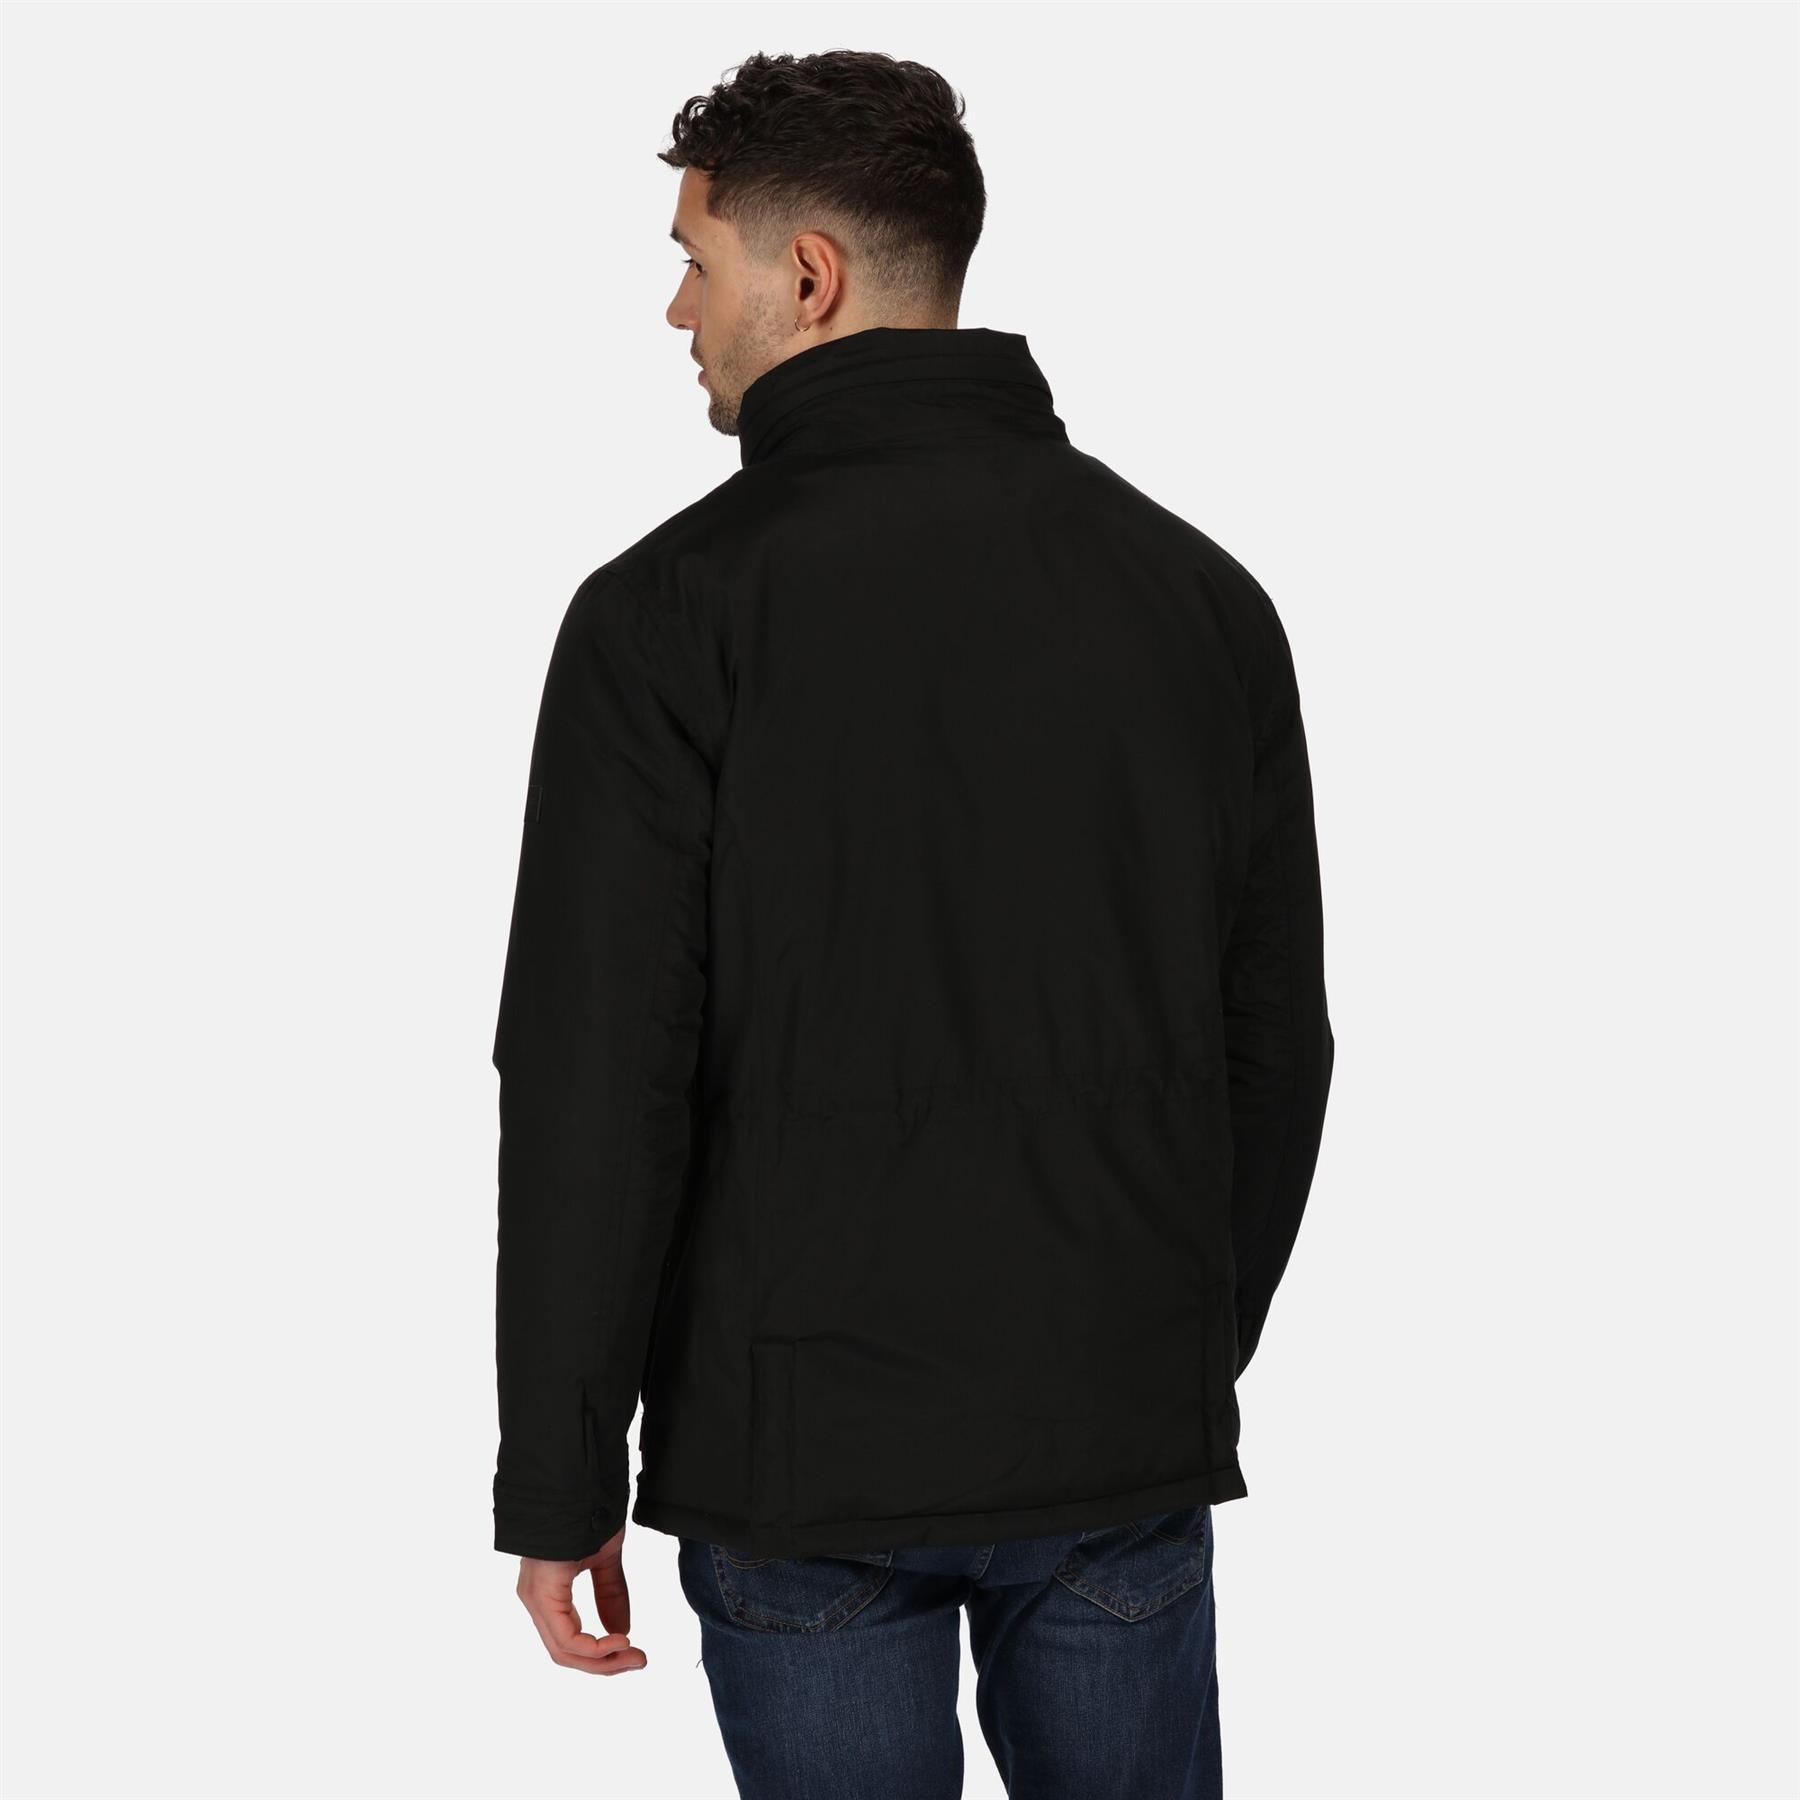 miniatuur 6 - Regatta Mens Rawson Waterproof Breathable Insulated Jacket Coat